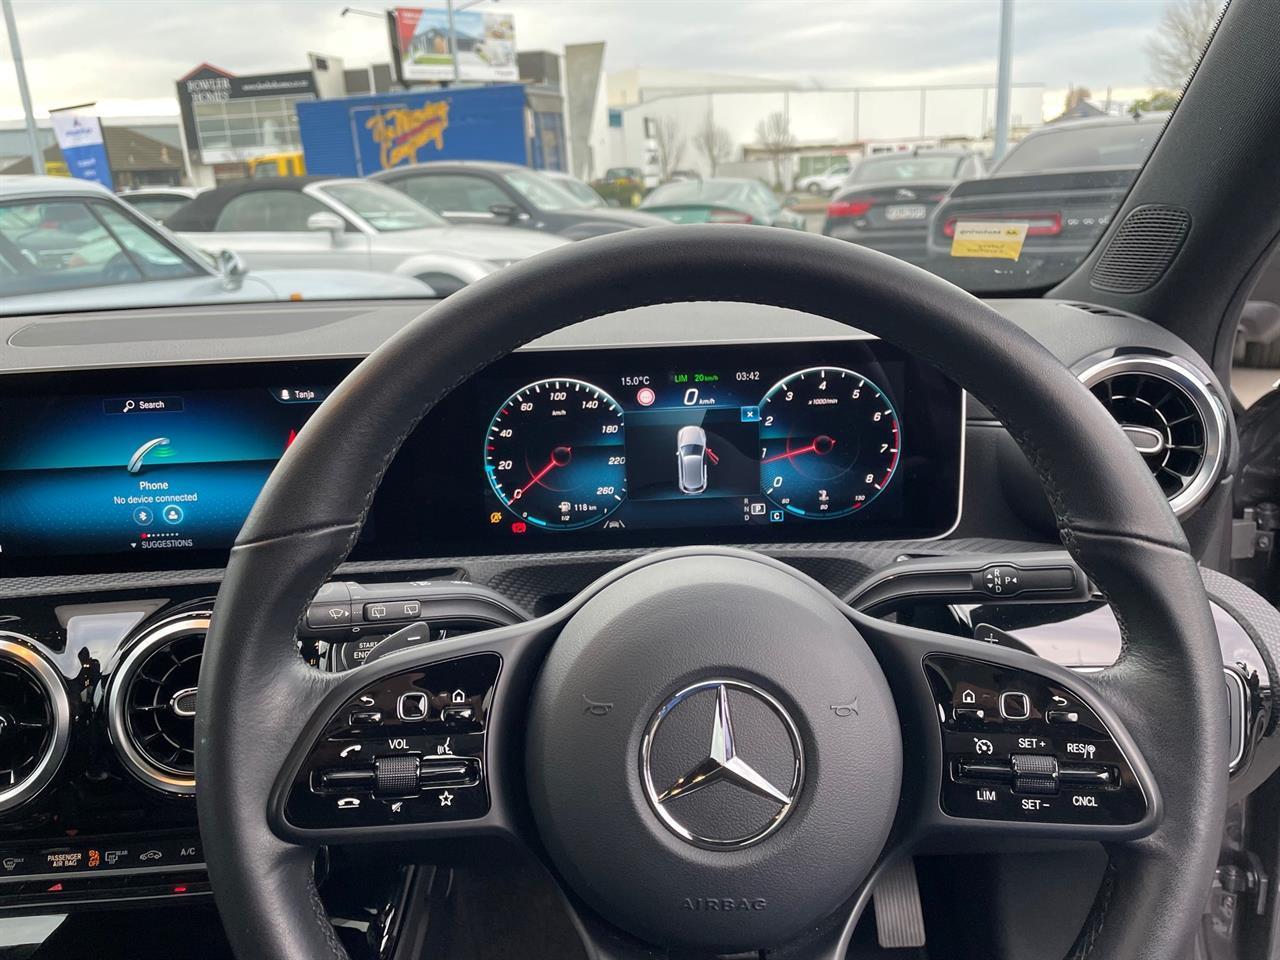 image-13, 2019 MercedesBenz A180 1.3T 7 Speed New Model at Christchurch